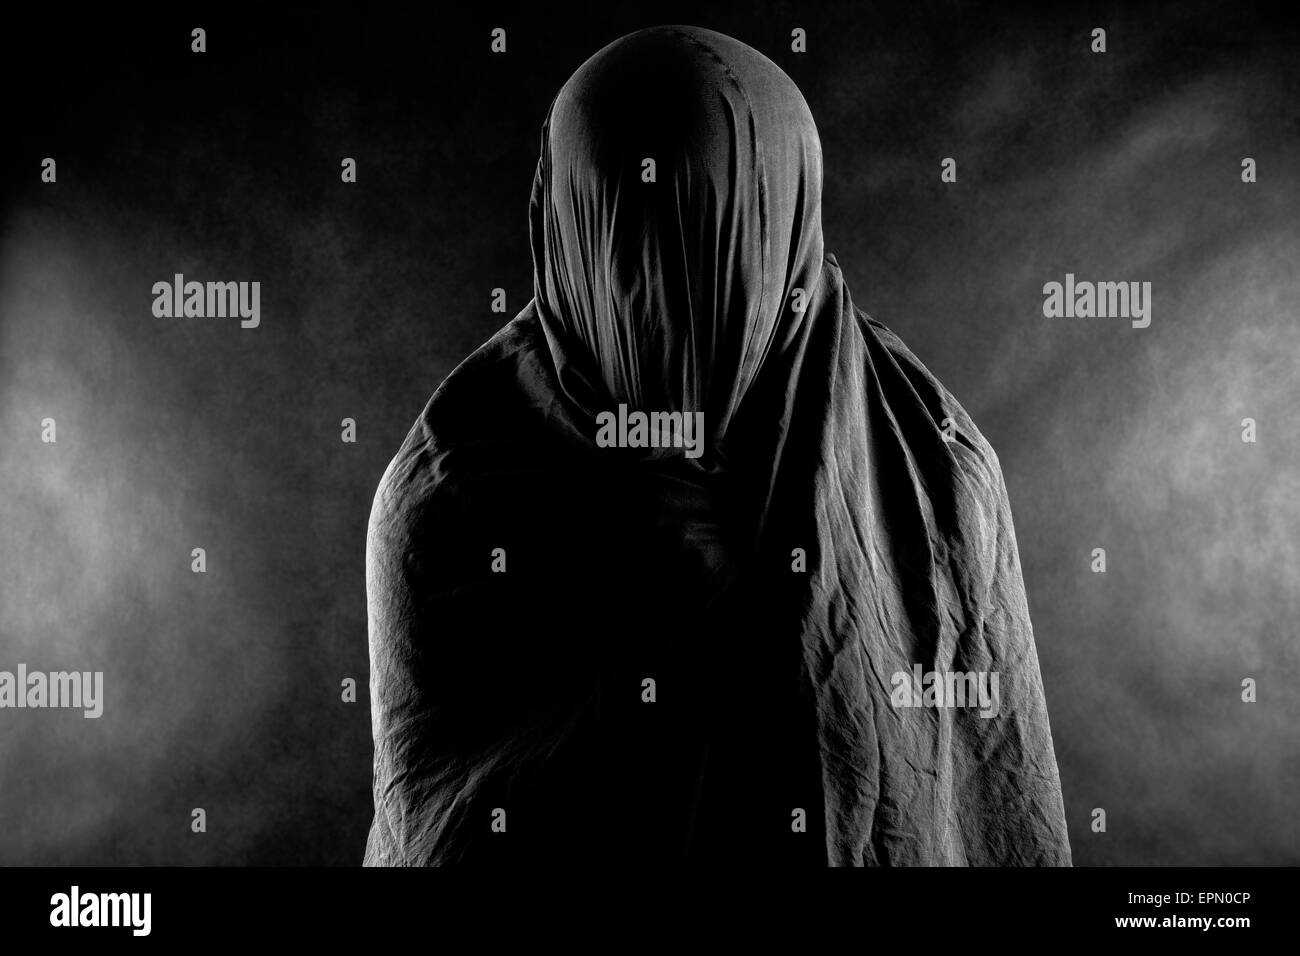 Geister in der Dunkelheit Stockbild